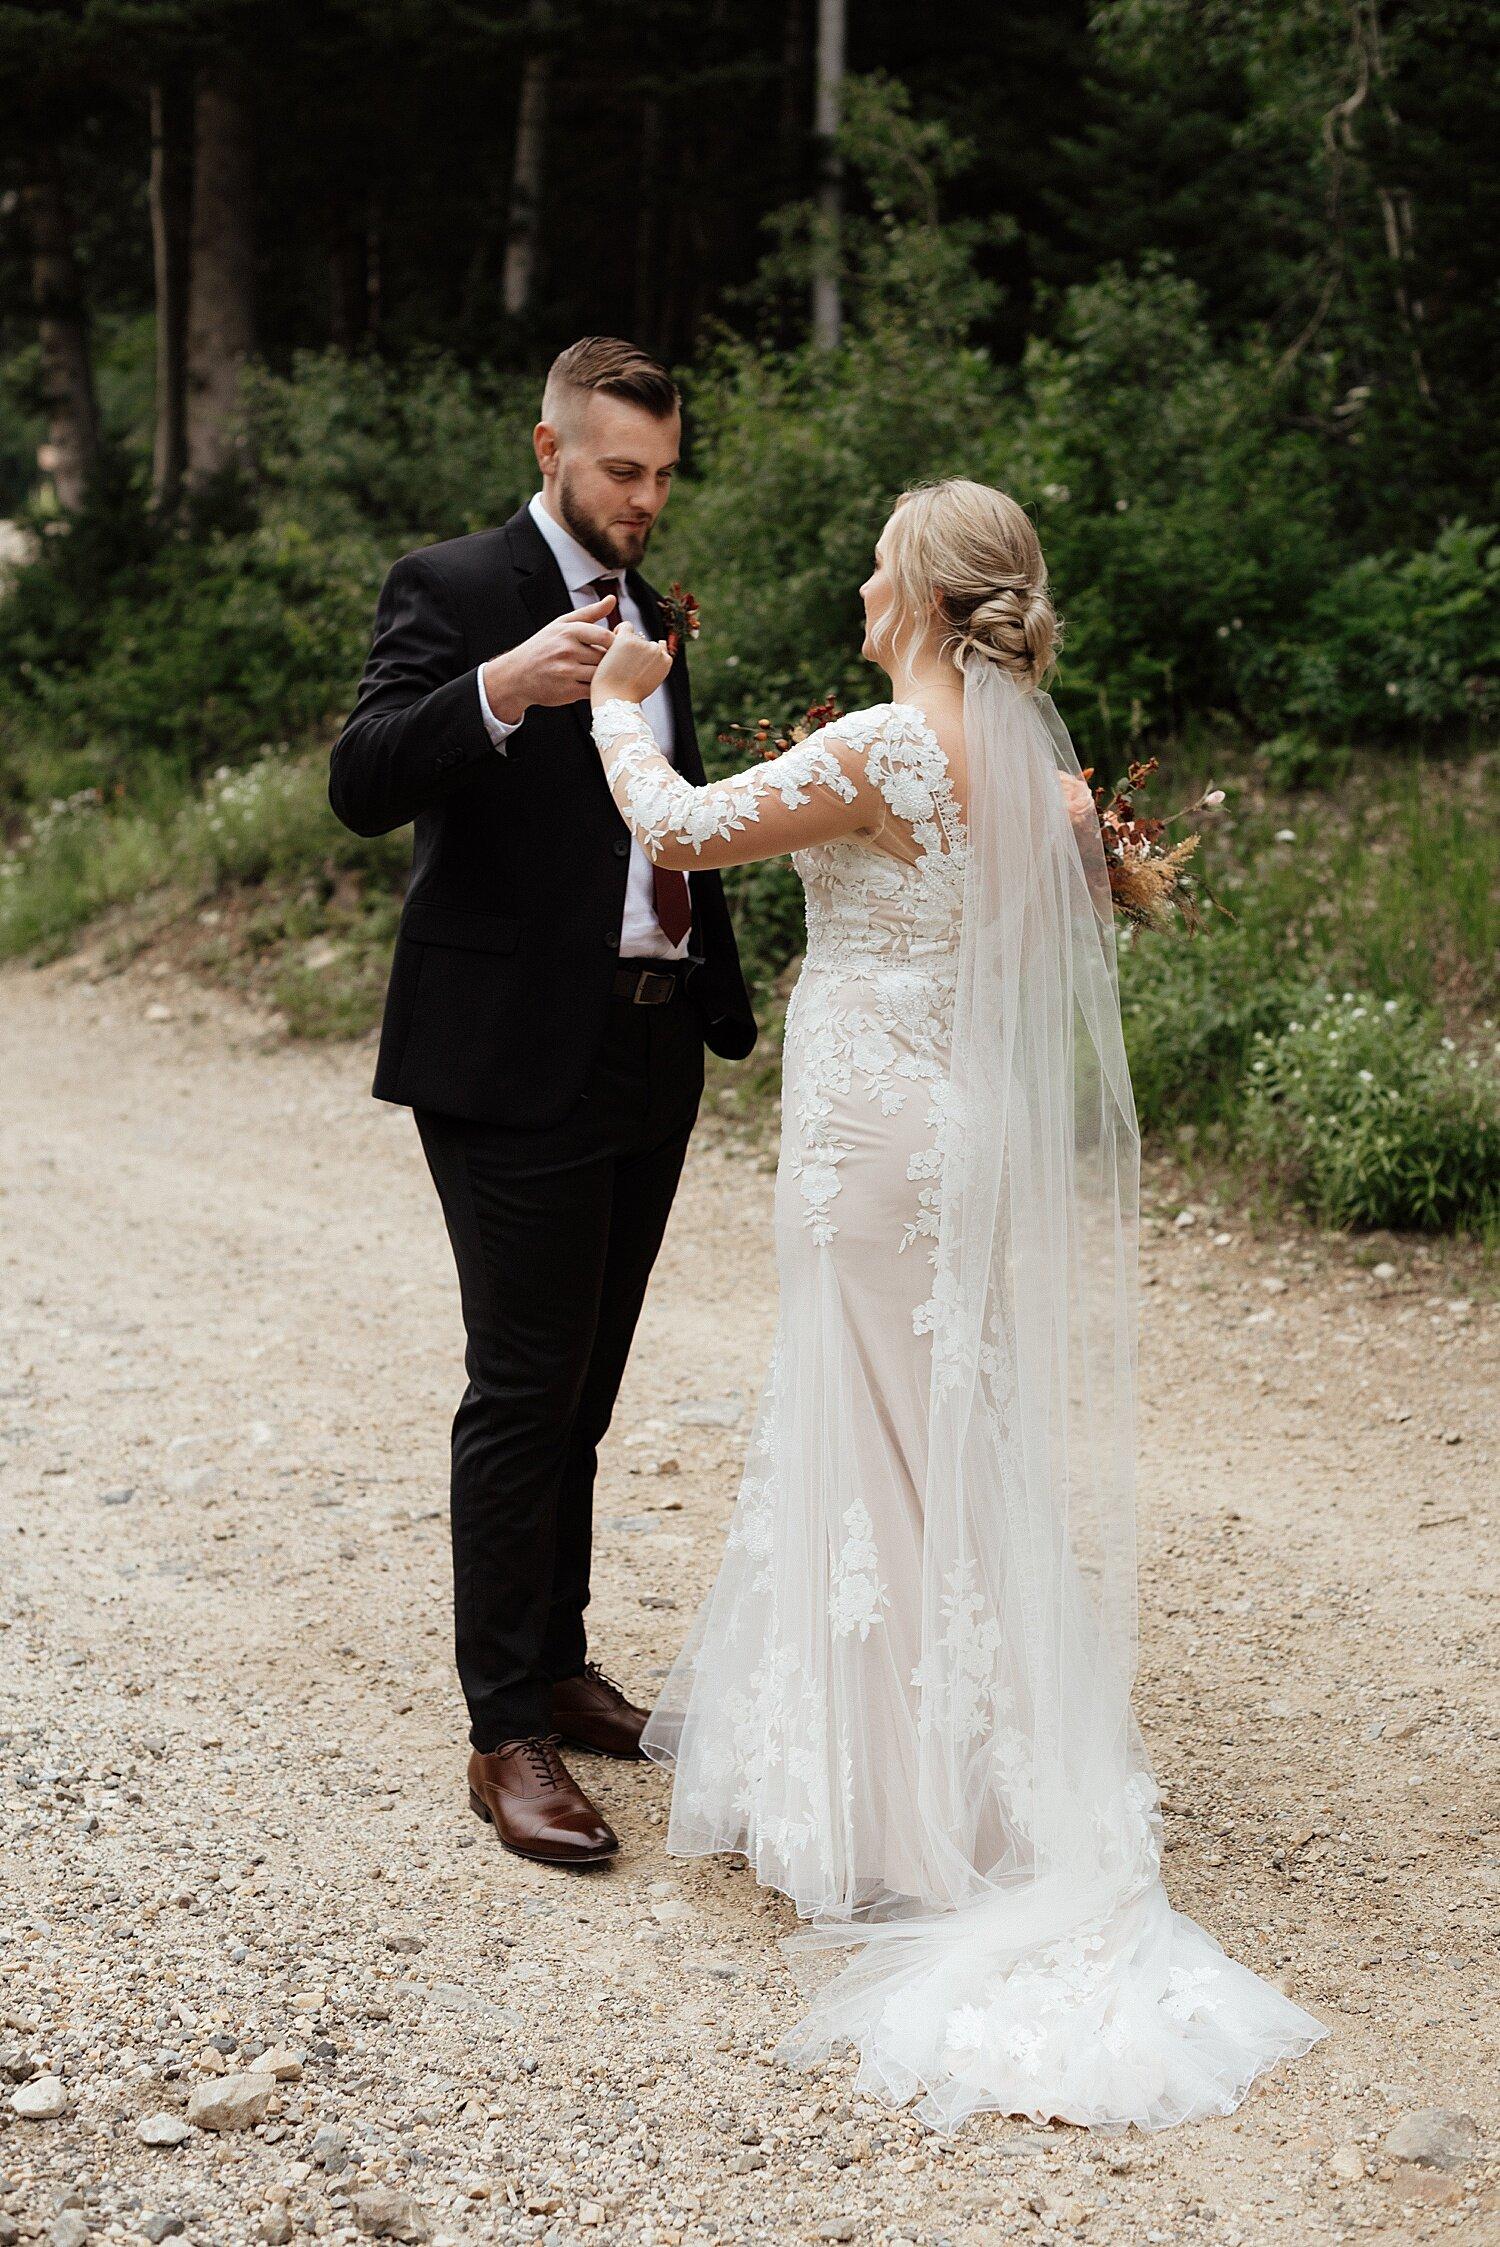 Zandra Barriga Photo - Hunter and Brighton Mountain Bridals_0005.jpg